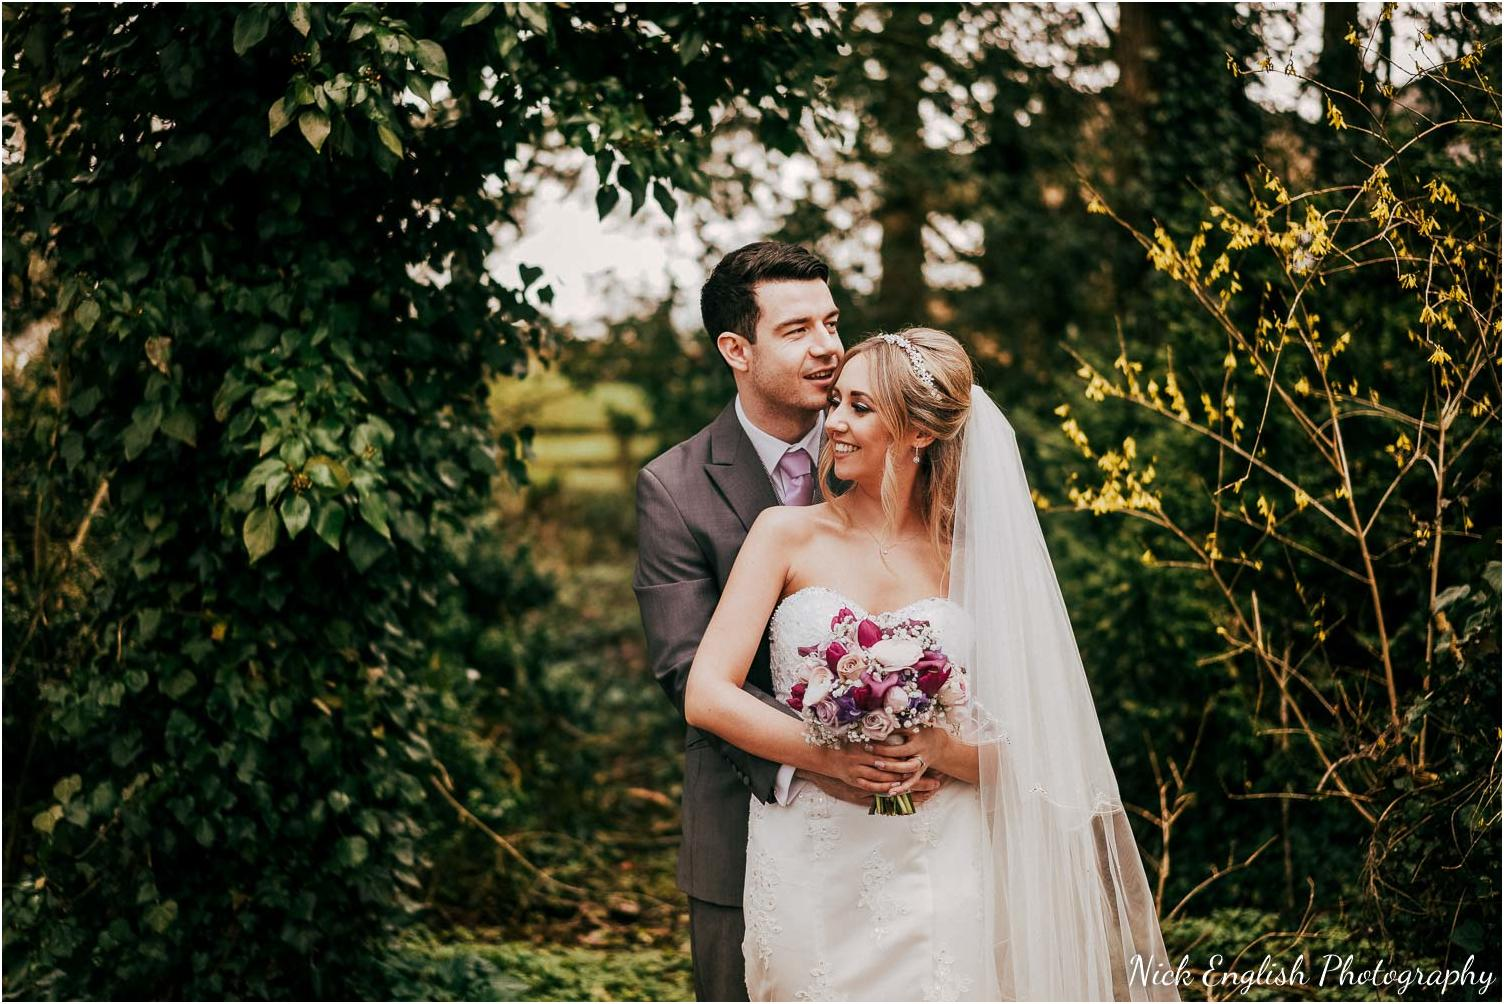 Mitton_Hall_Wedding_Photographer_2018-112.jpg